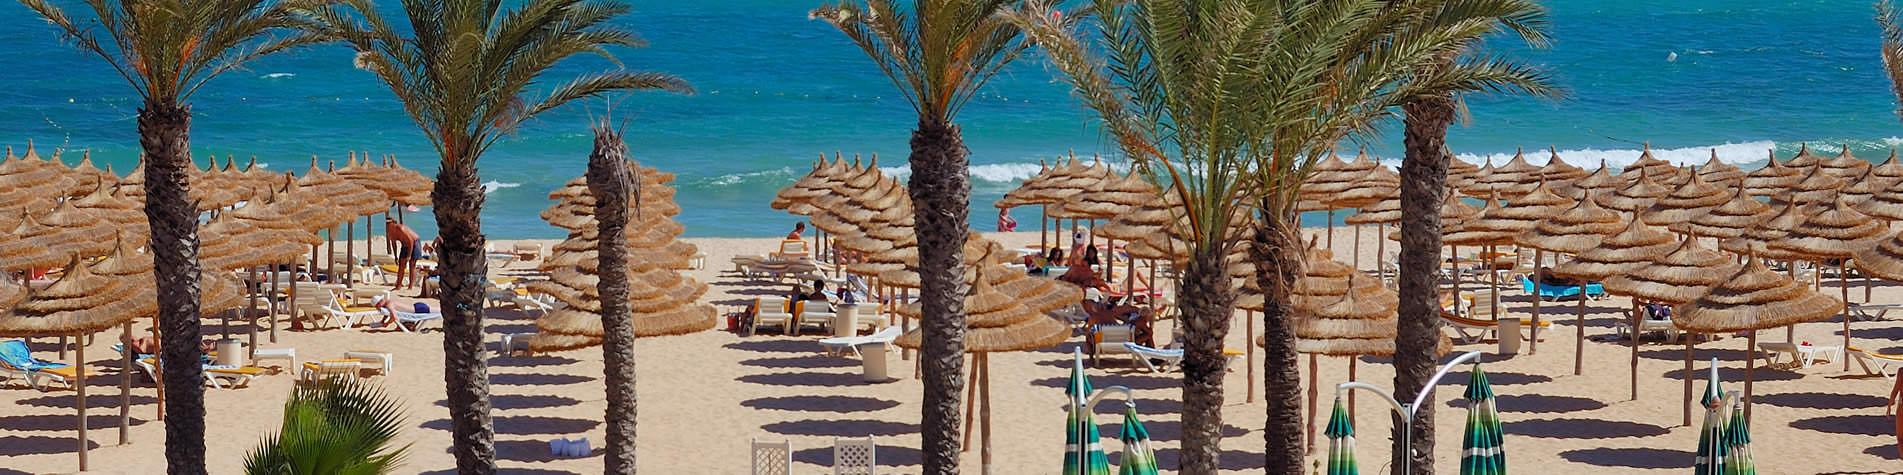 Tunisia Holidays Specialists